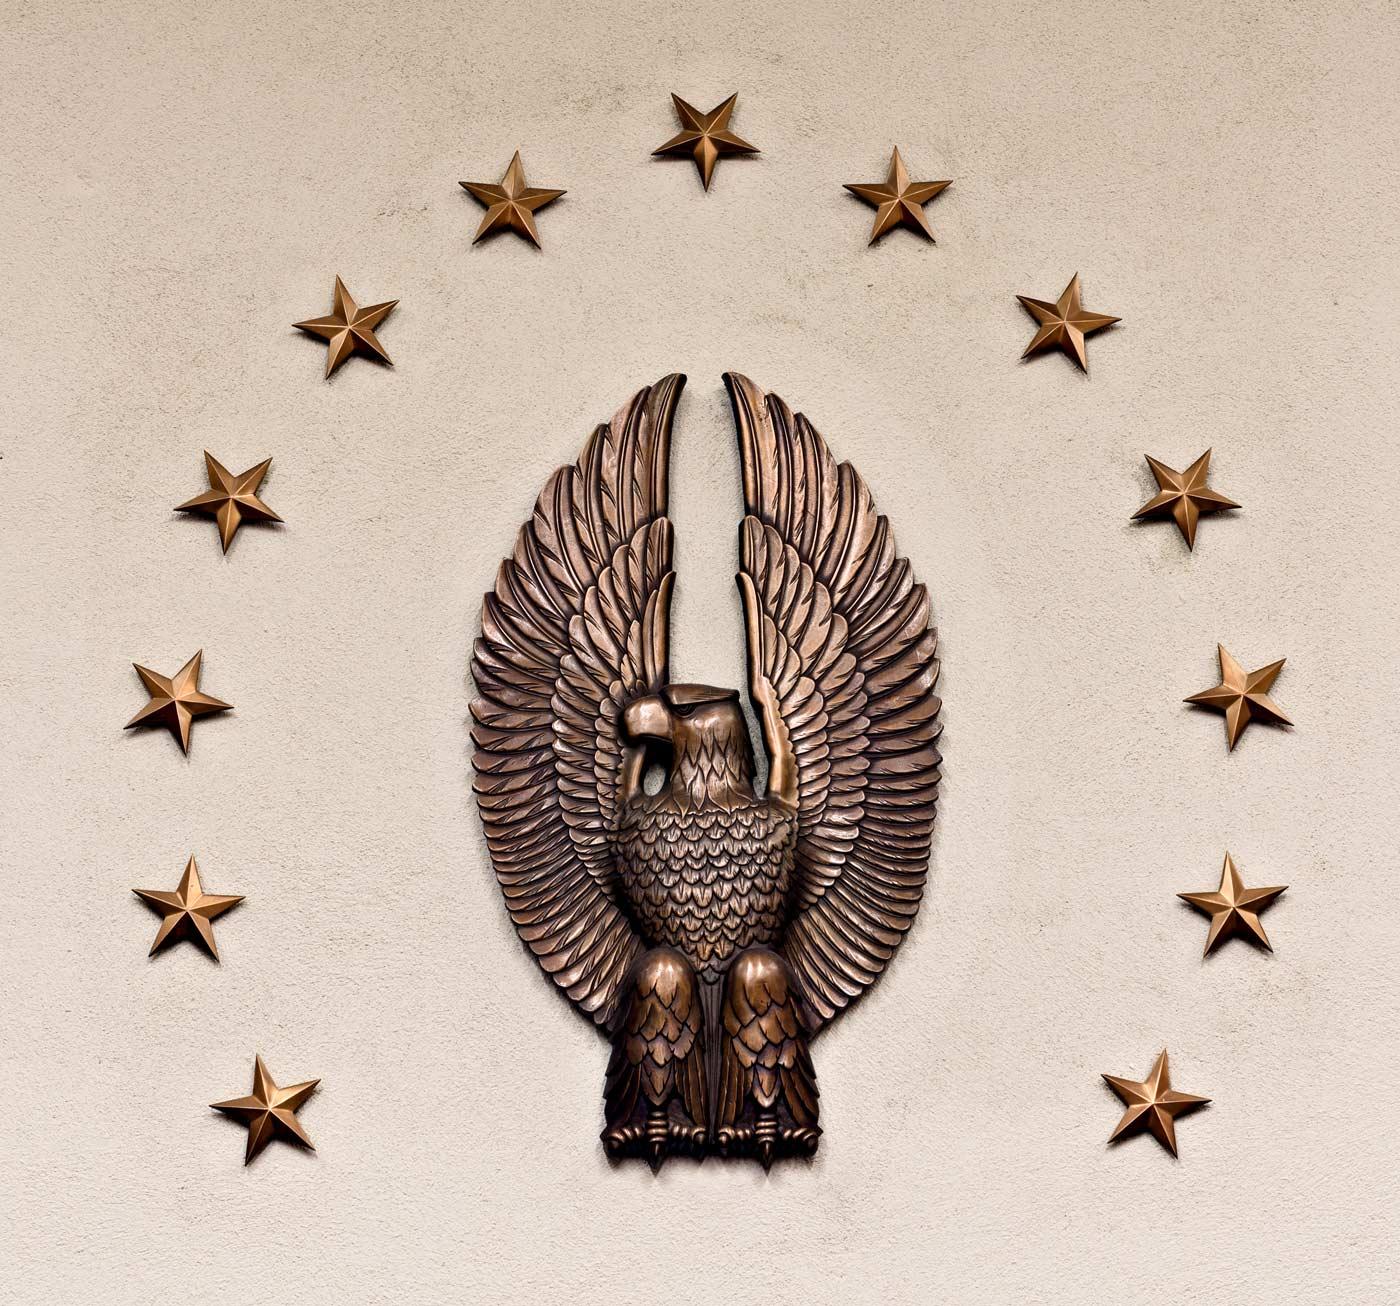 1936 Courtroom eagle at U.S. Court House, Austin, Texas